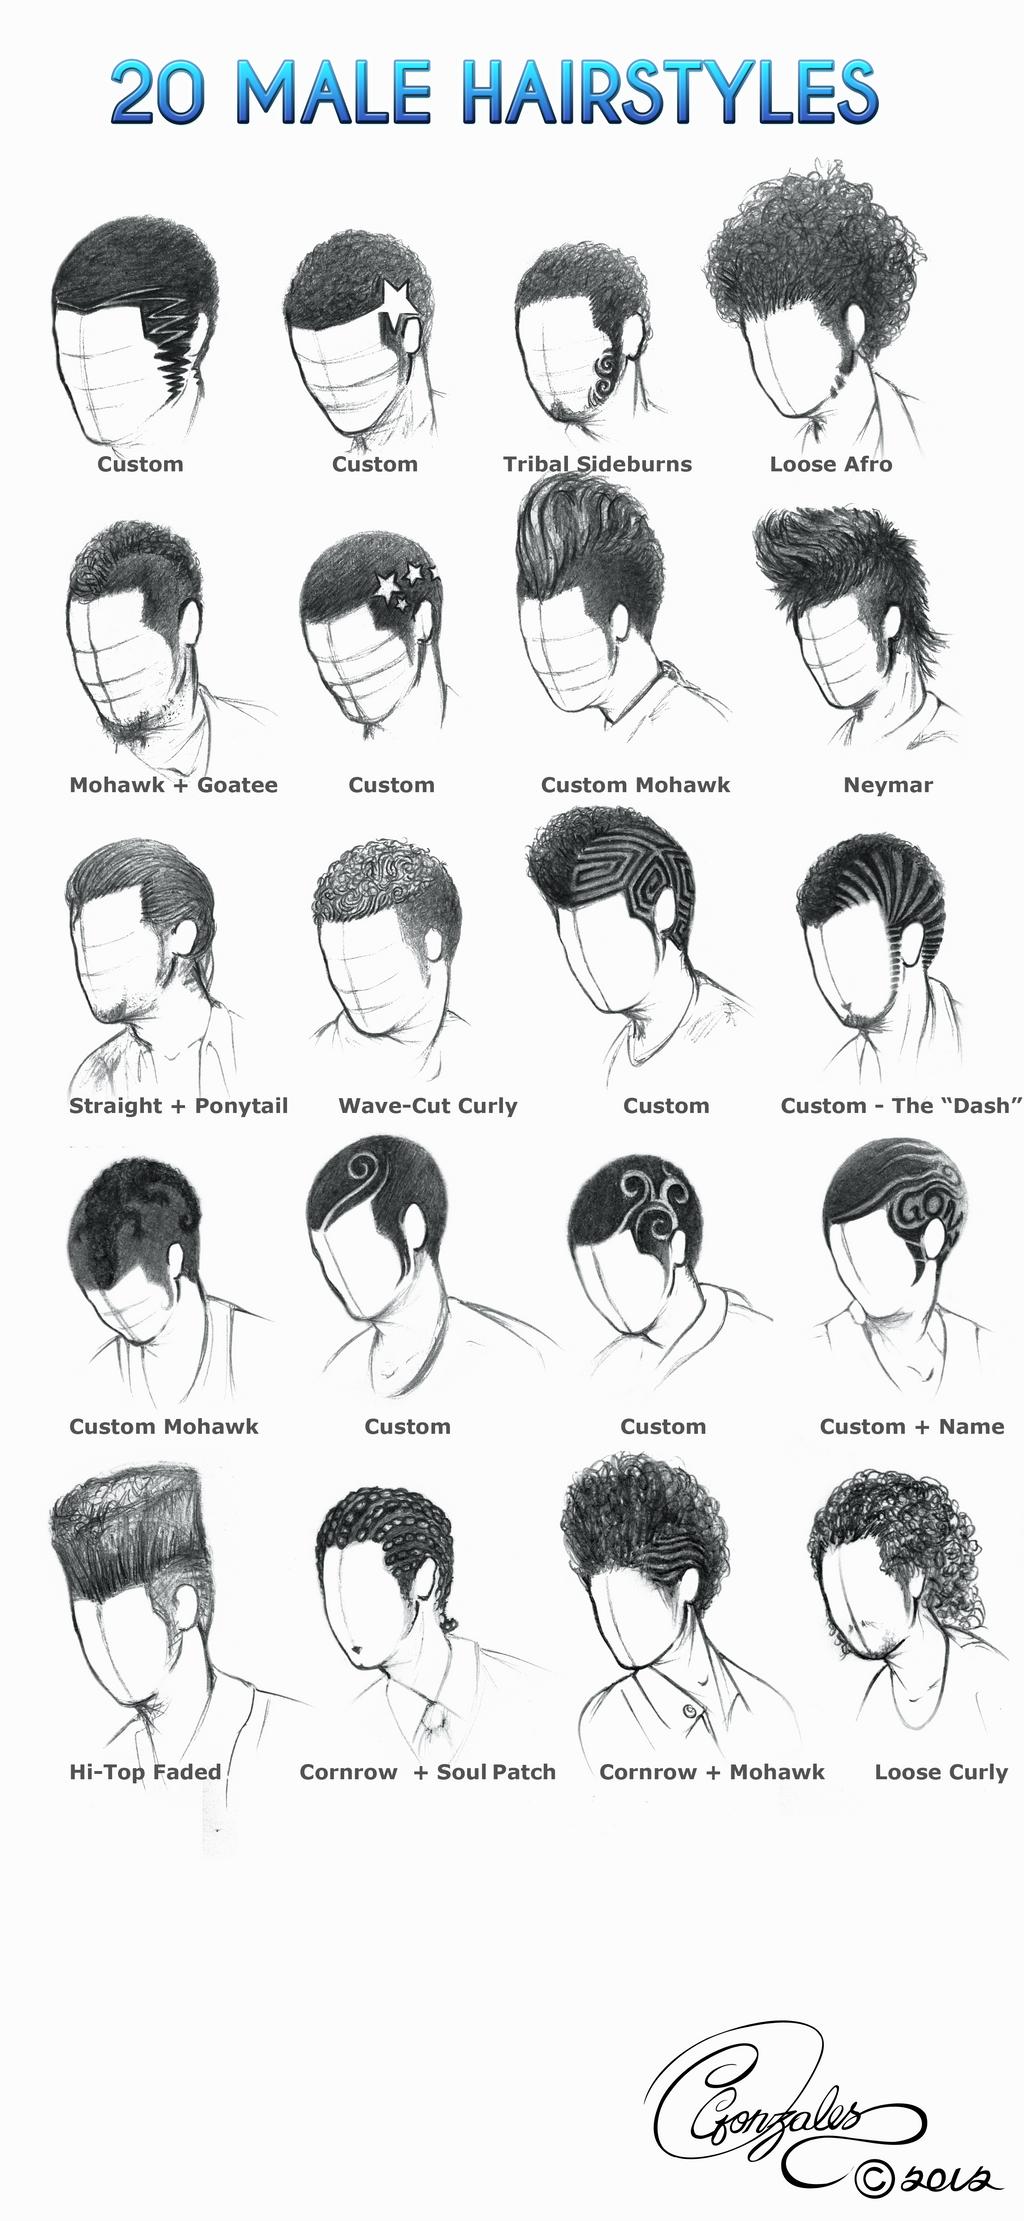 20 Male Hairstyles by gunzy1 on DeviantArt